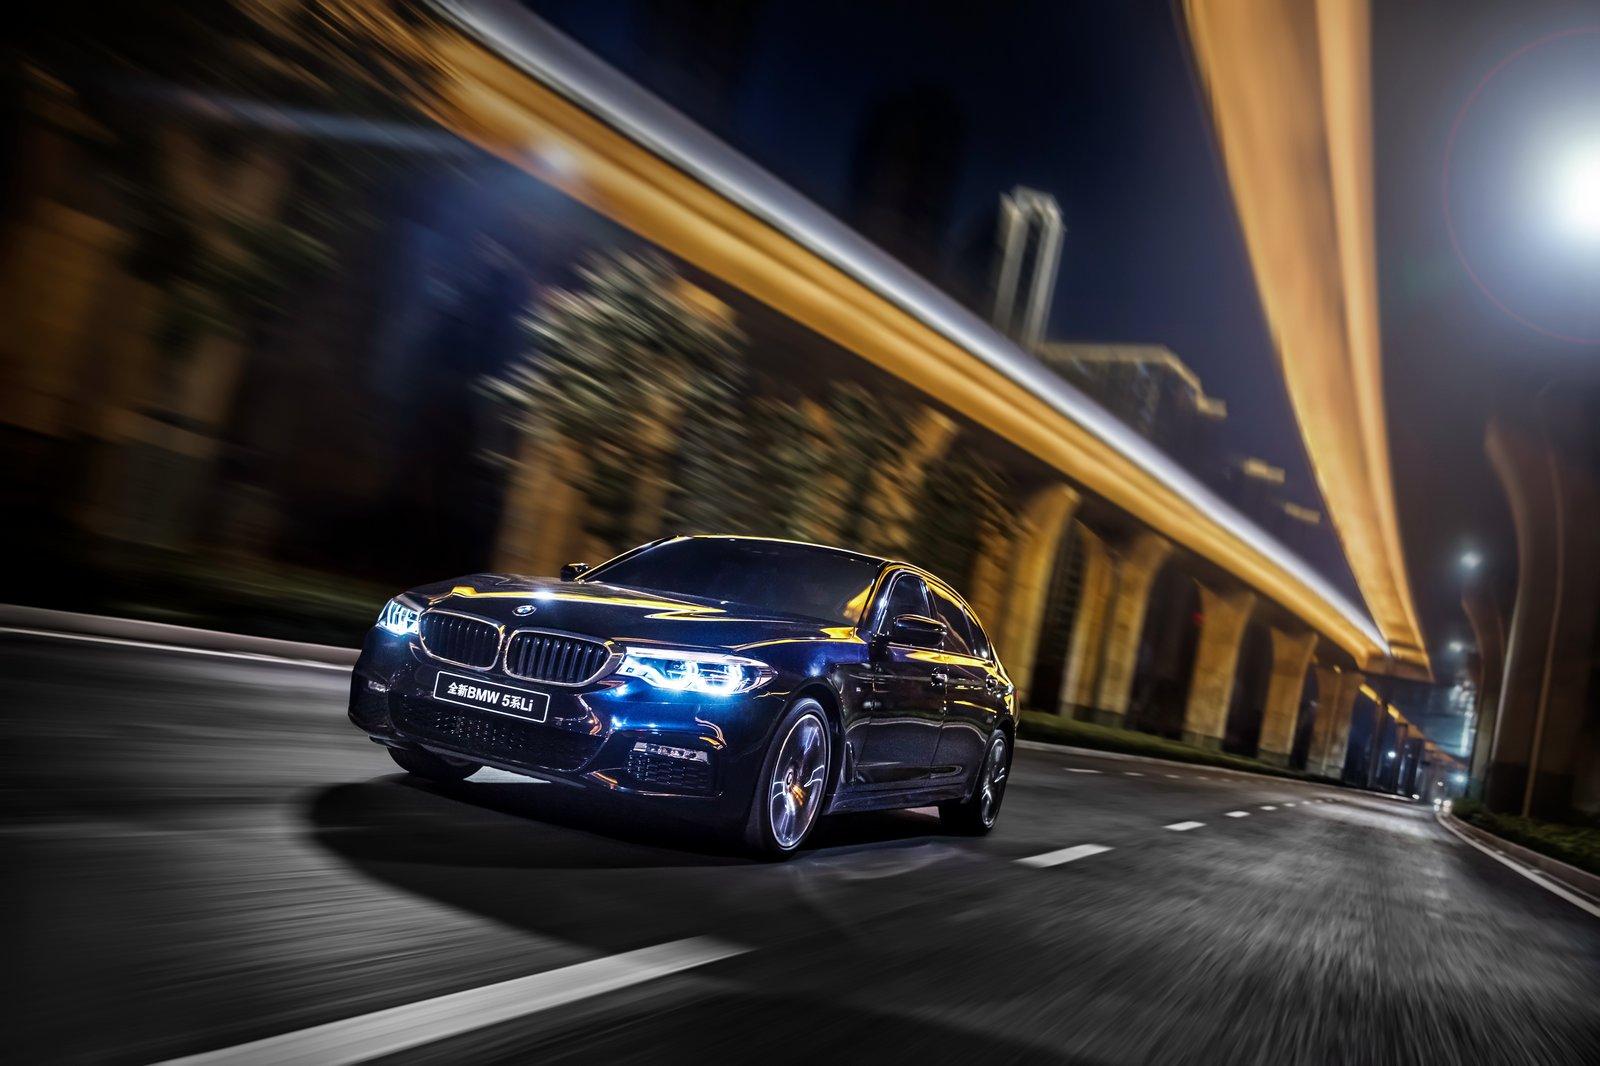 BMW-5-Series-LWB-15.jpg